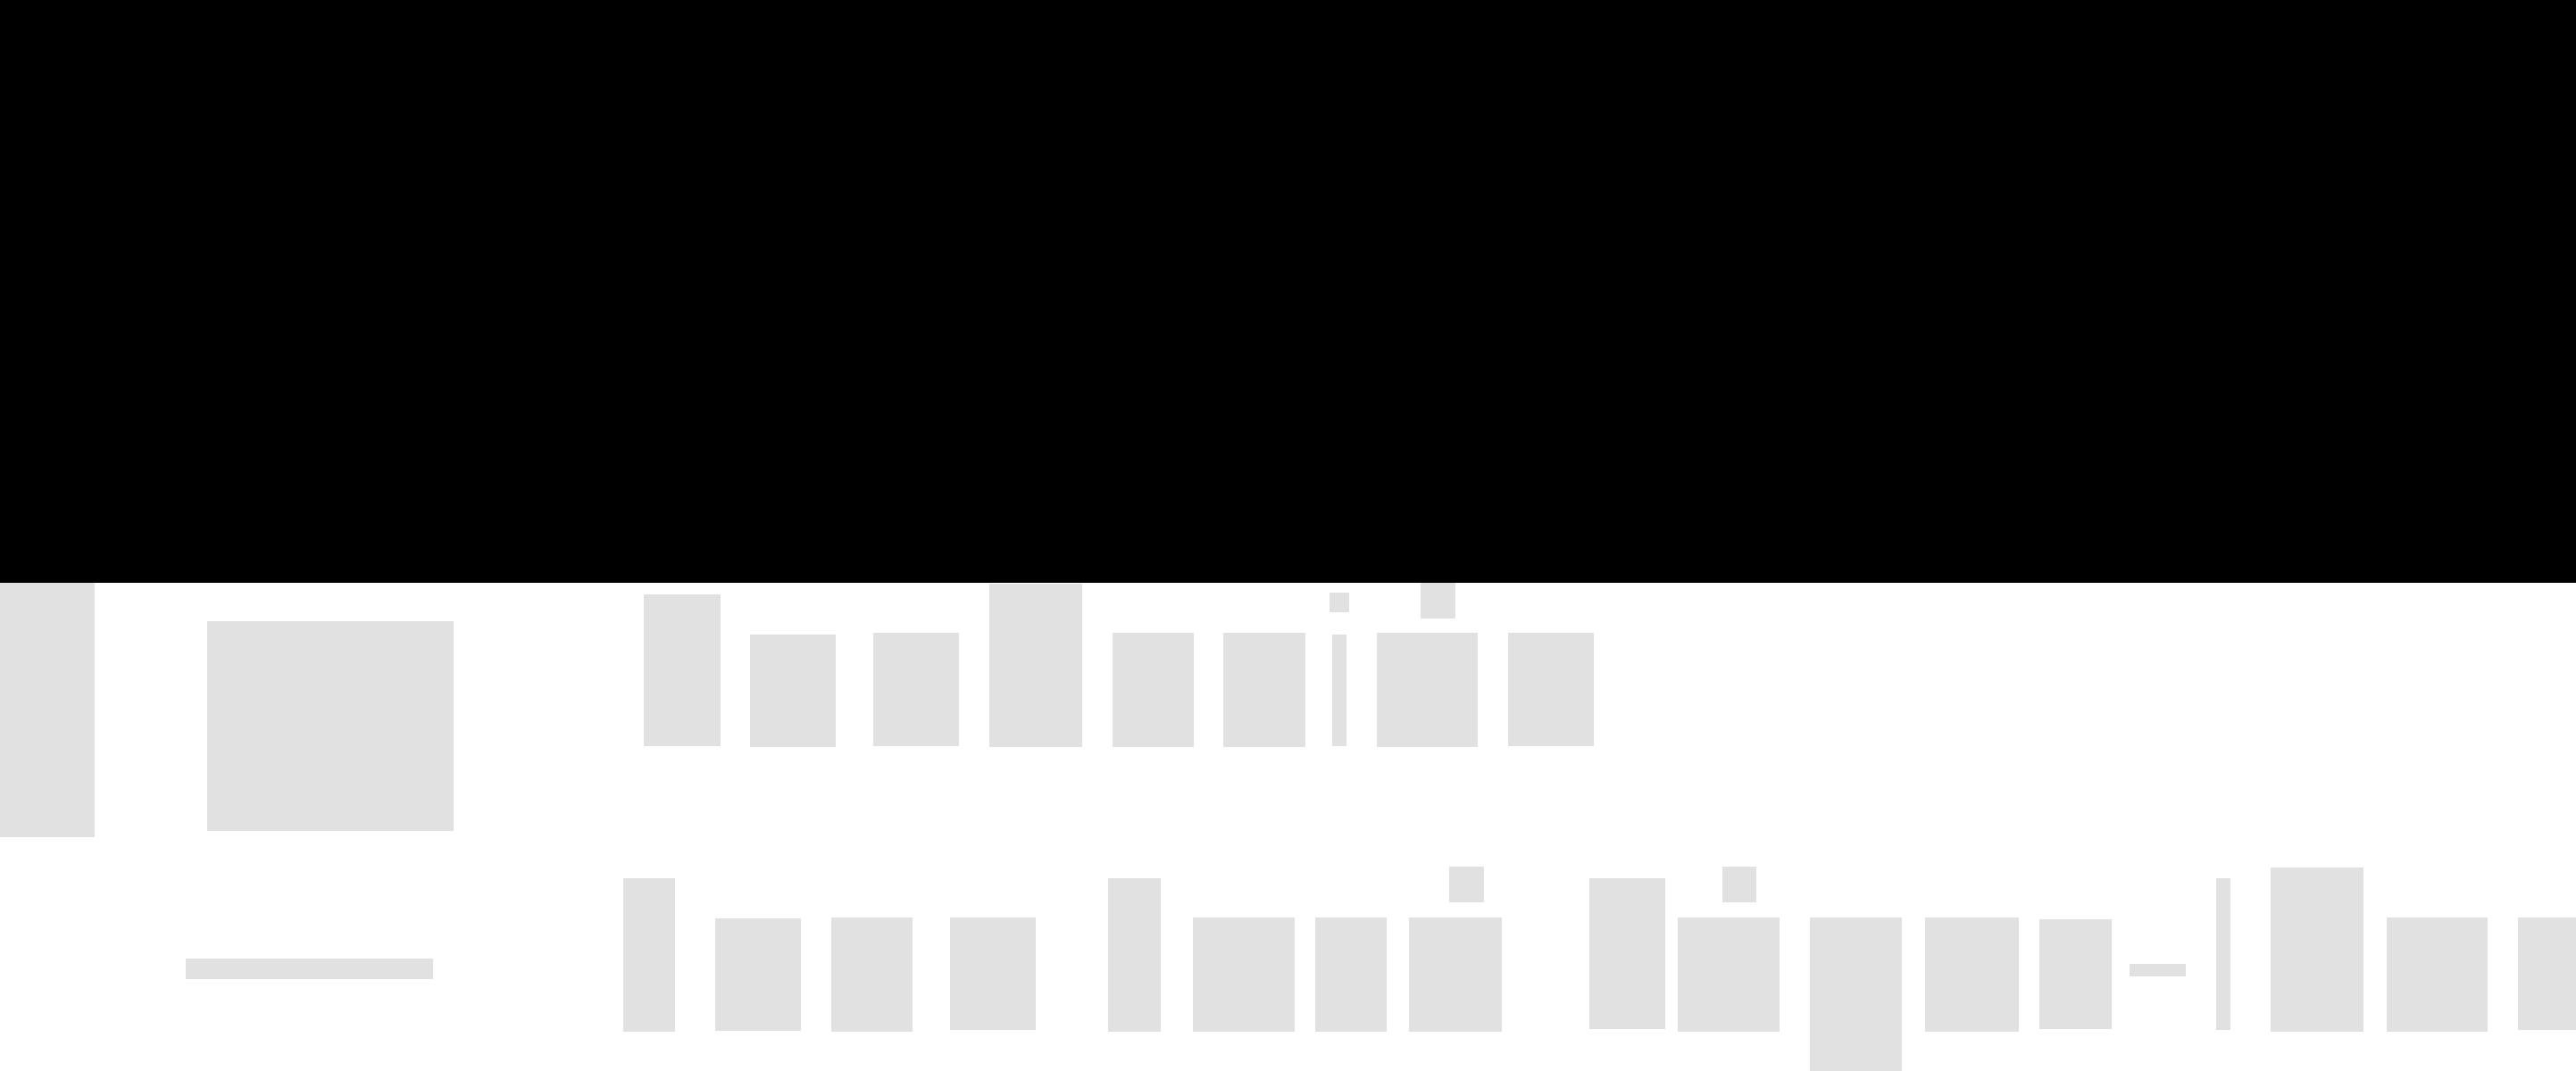 Juan jose lopez ibor